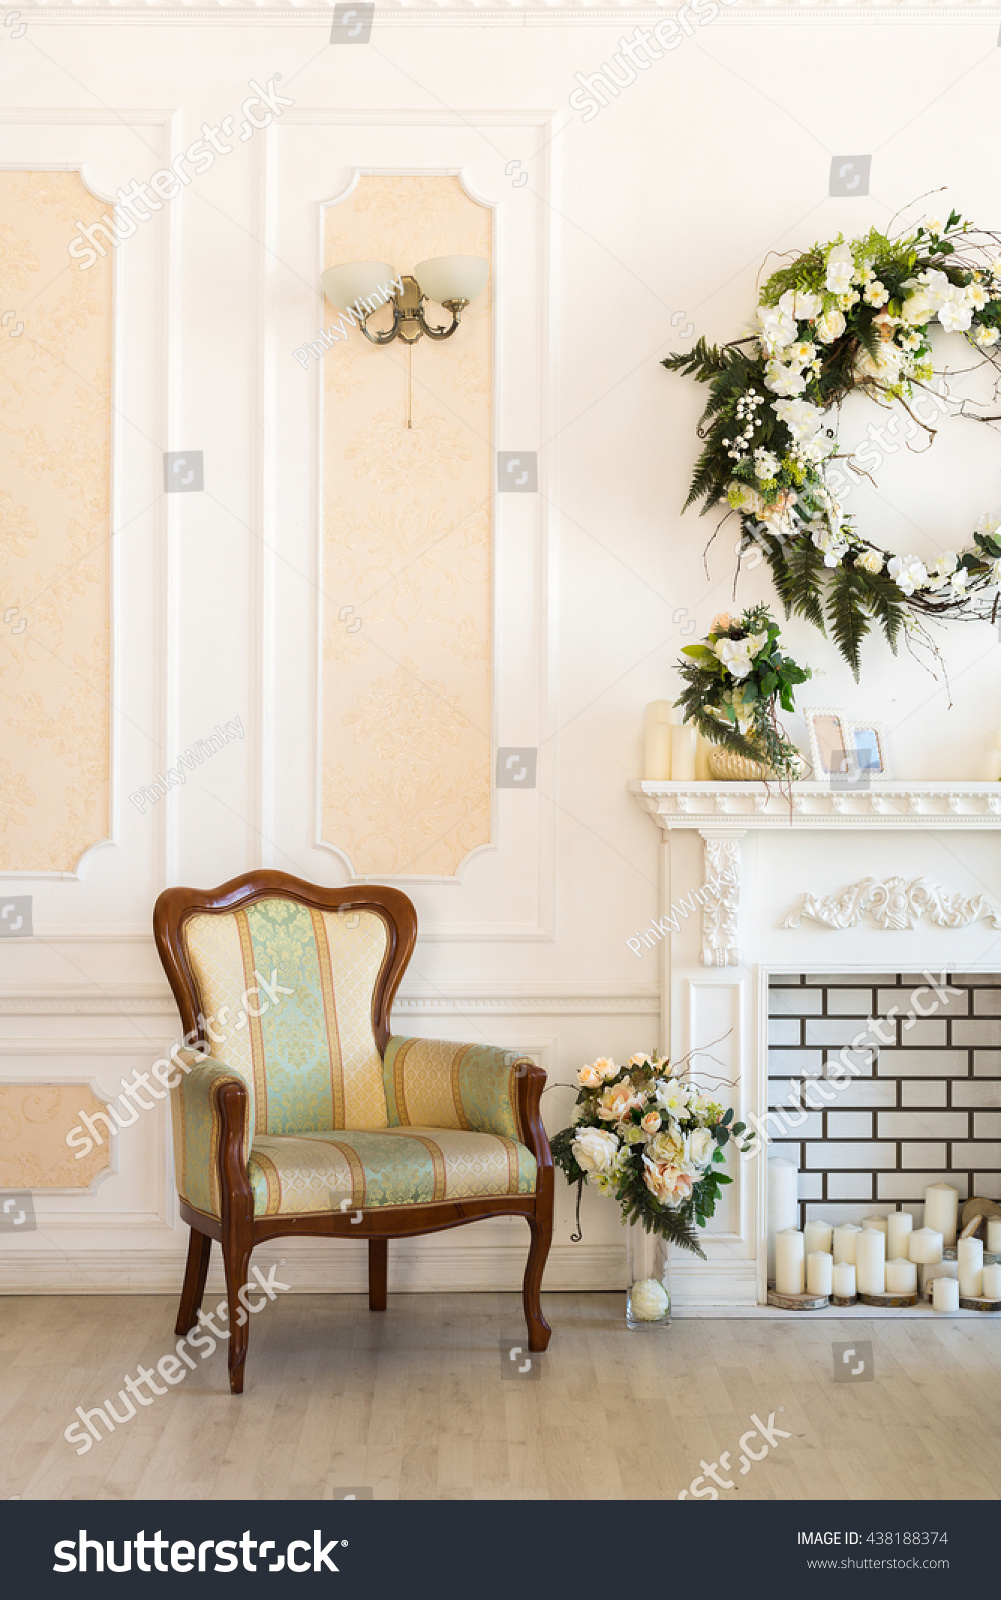 Luxury Stylish Bright Light Interior Sitting Stock Photo 438188374 ...